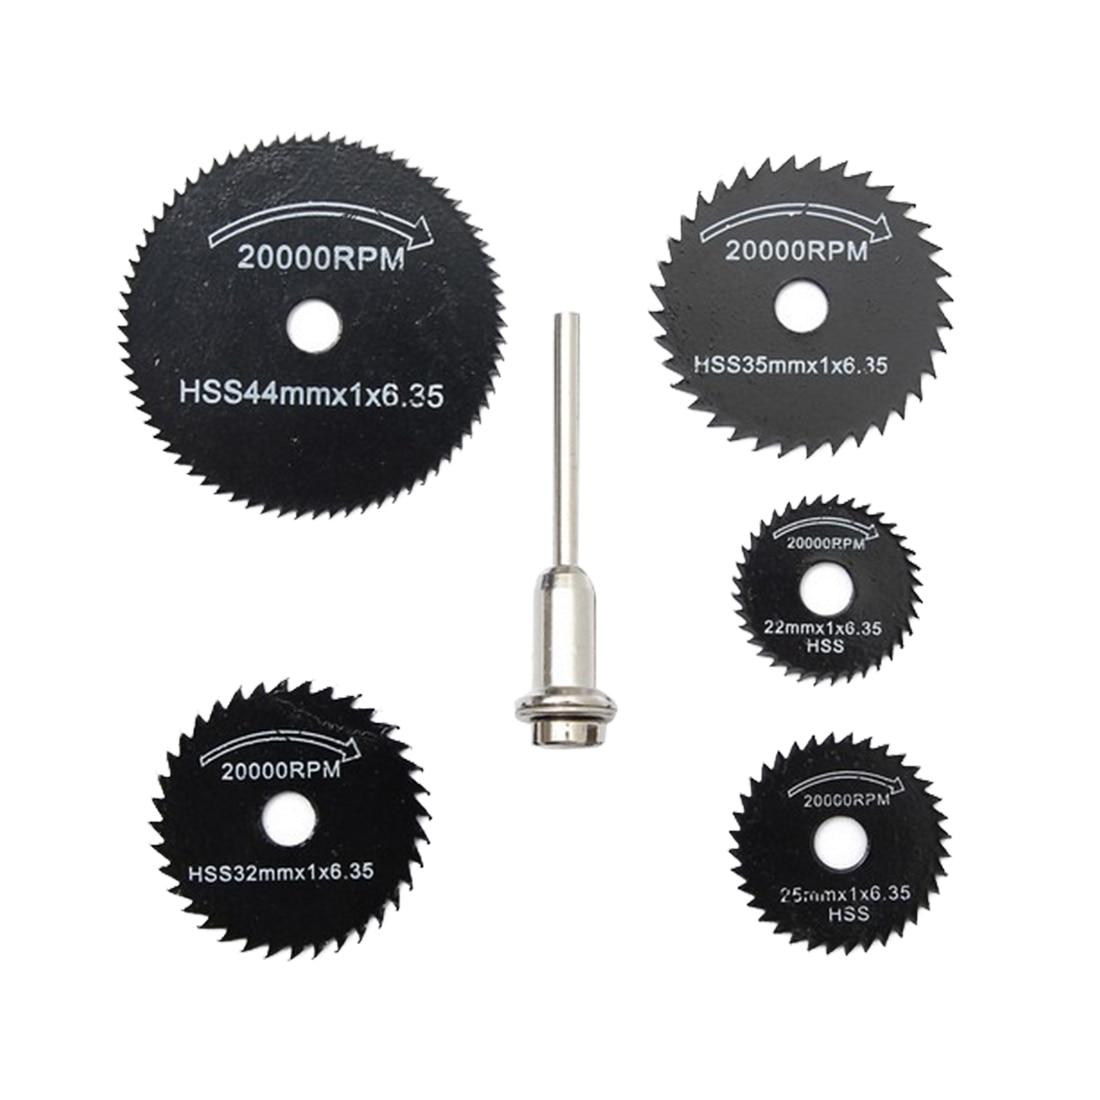 6Pcs Drill Dremel Accessories HSS Mini Circular Saw Blades Power Tools Wood Cutting Disc Grinding Wheel Set For Dremel Tools